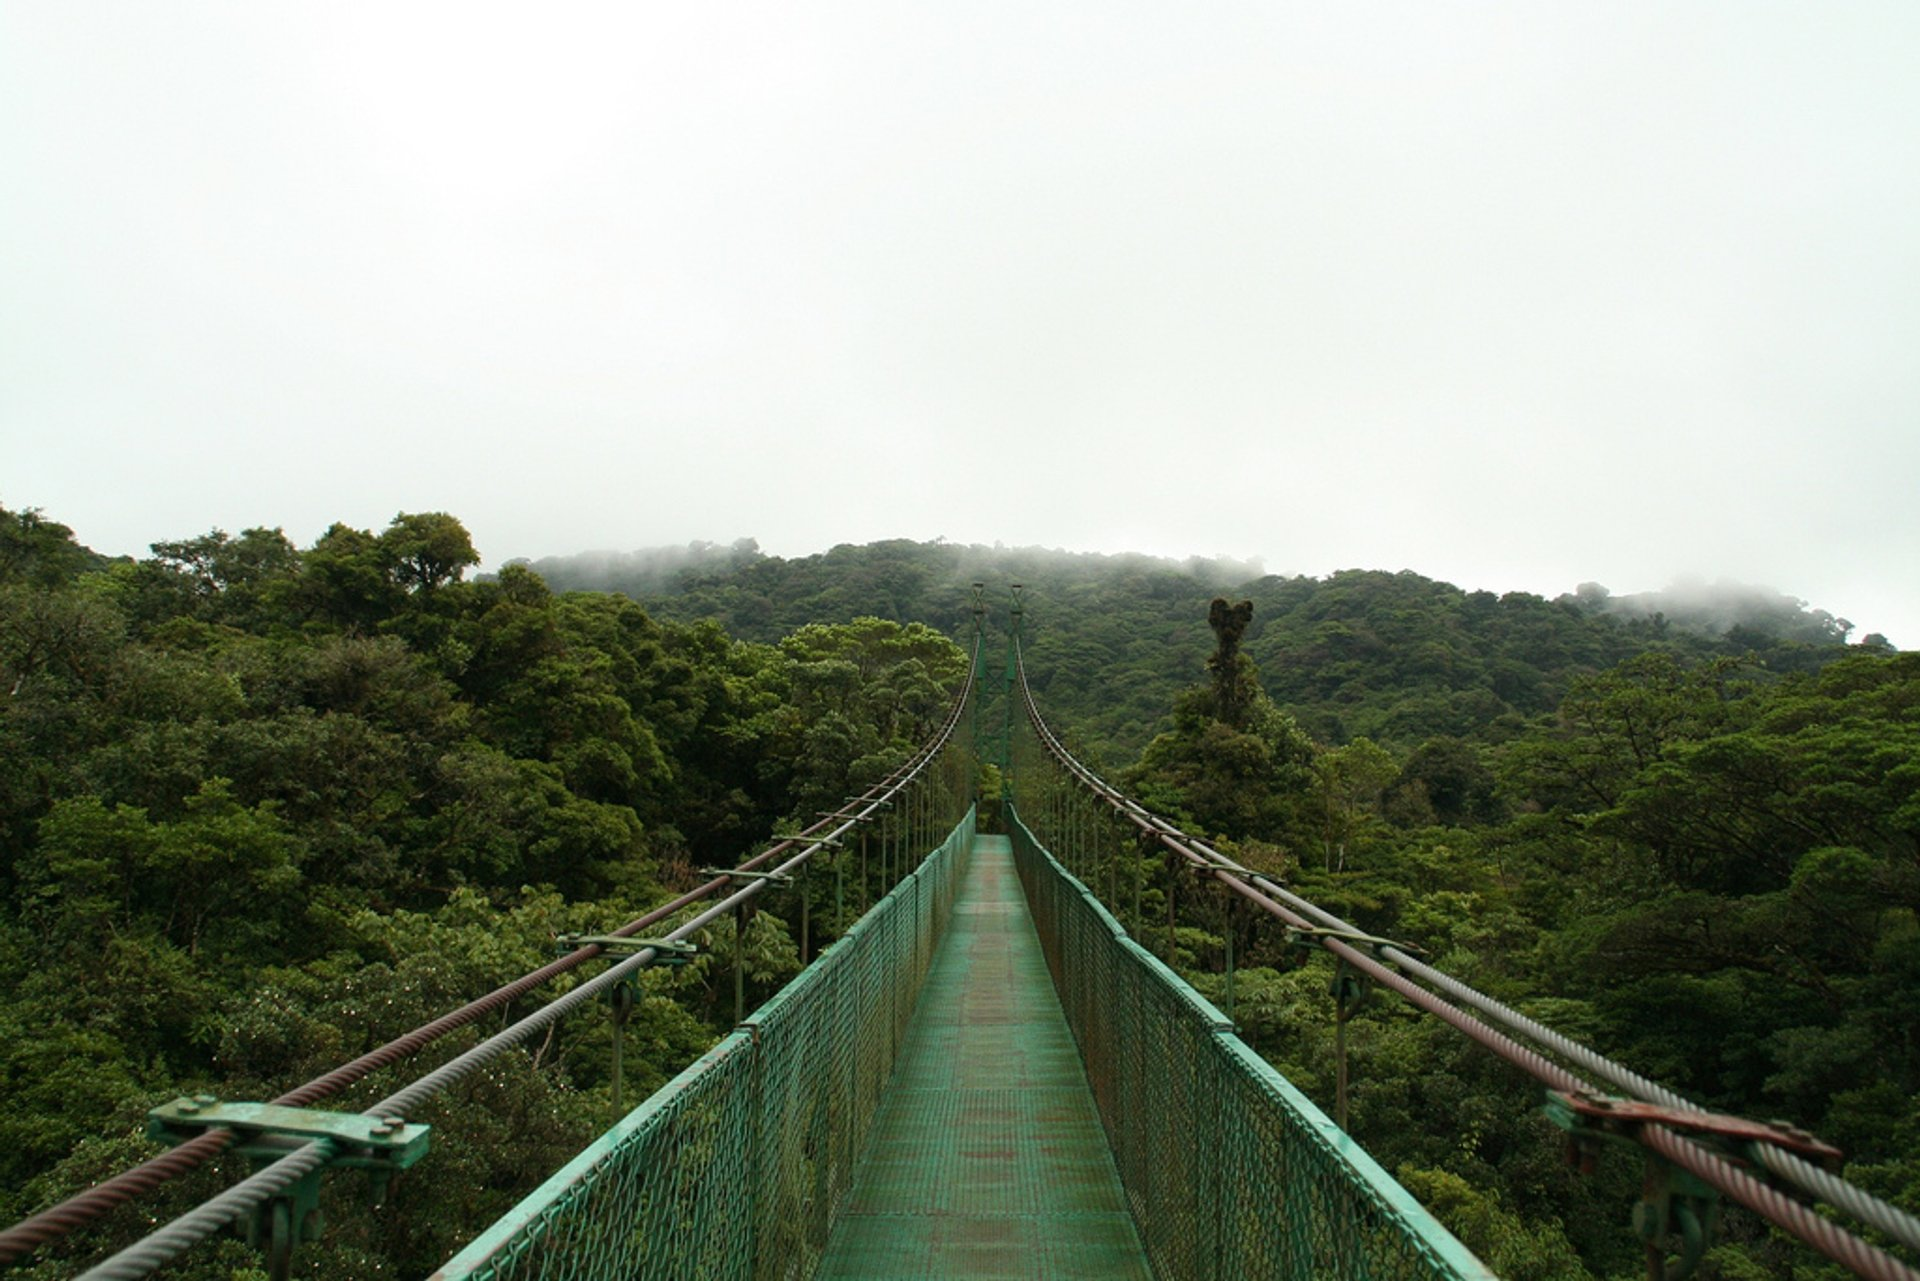 Wet Season (Summer) in Costa Rica 2019 - Best Time